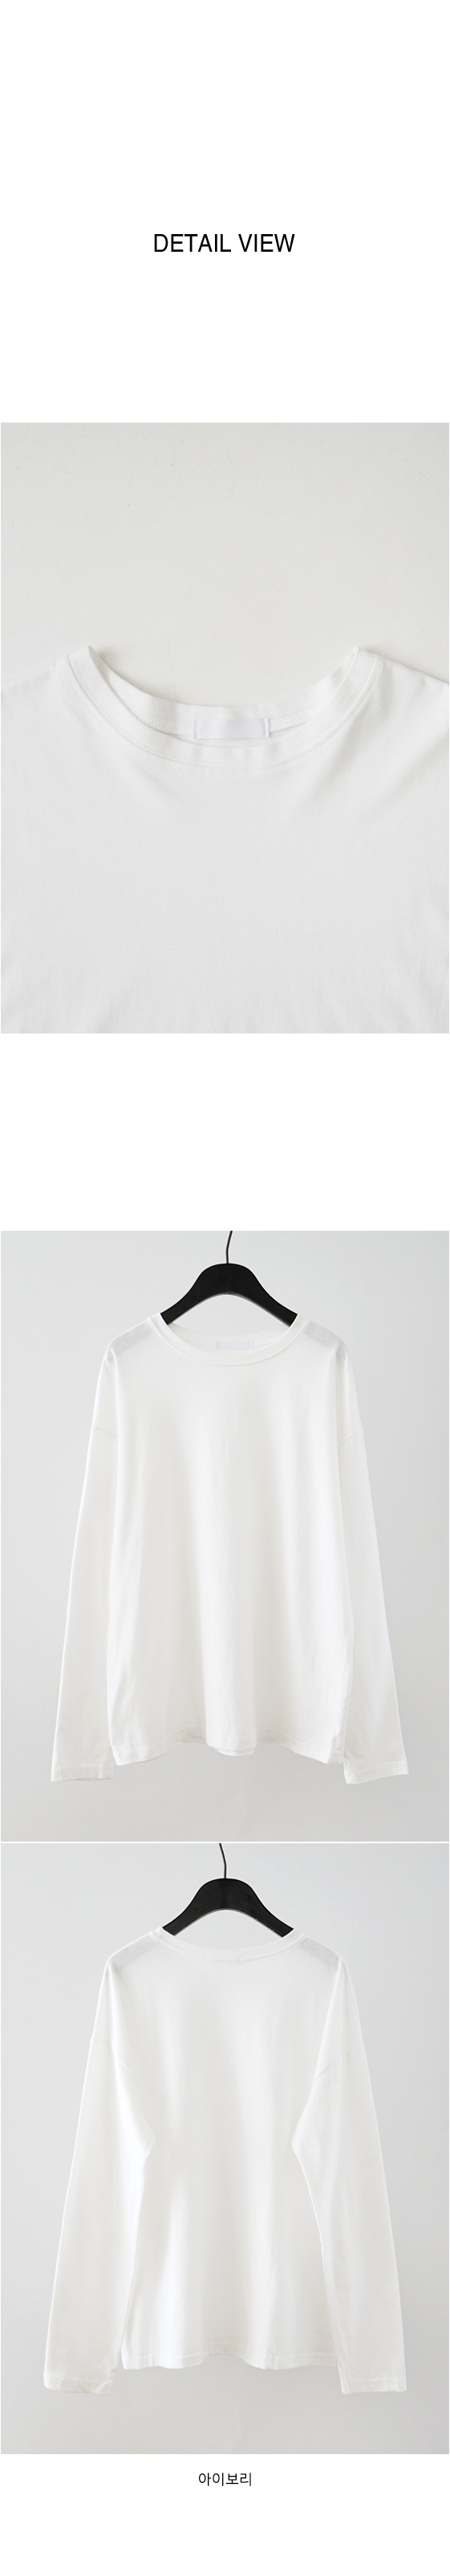 basic ivory cotton top